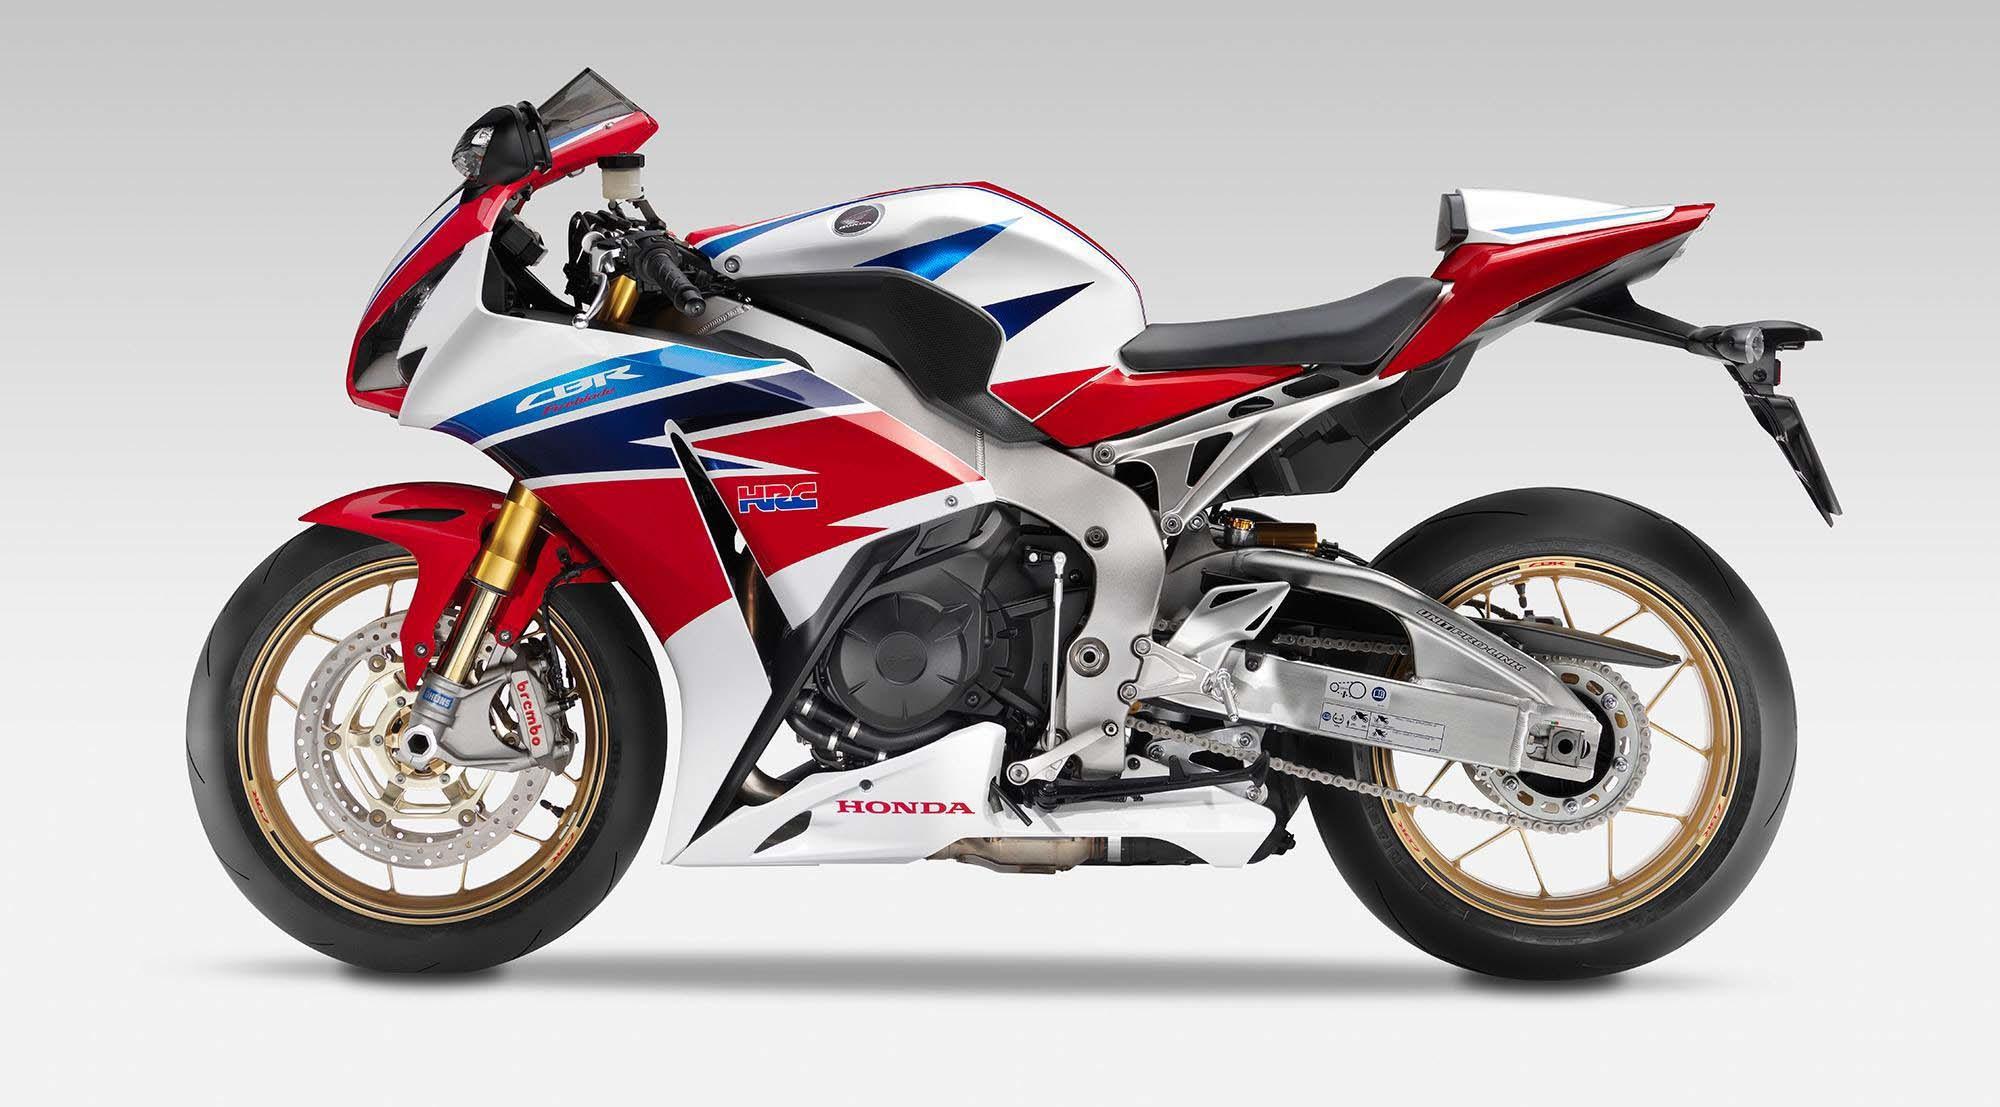 Res: 2000x1107, Honda Cbr1000rr Sp Fireblade Wallpapers Picture